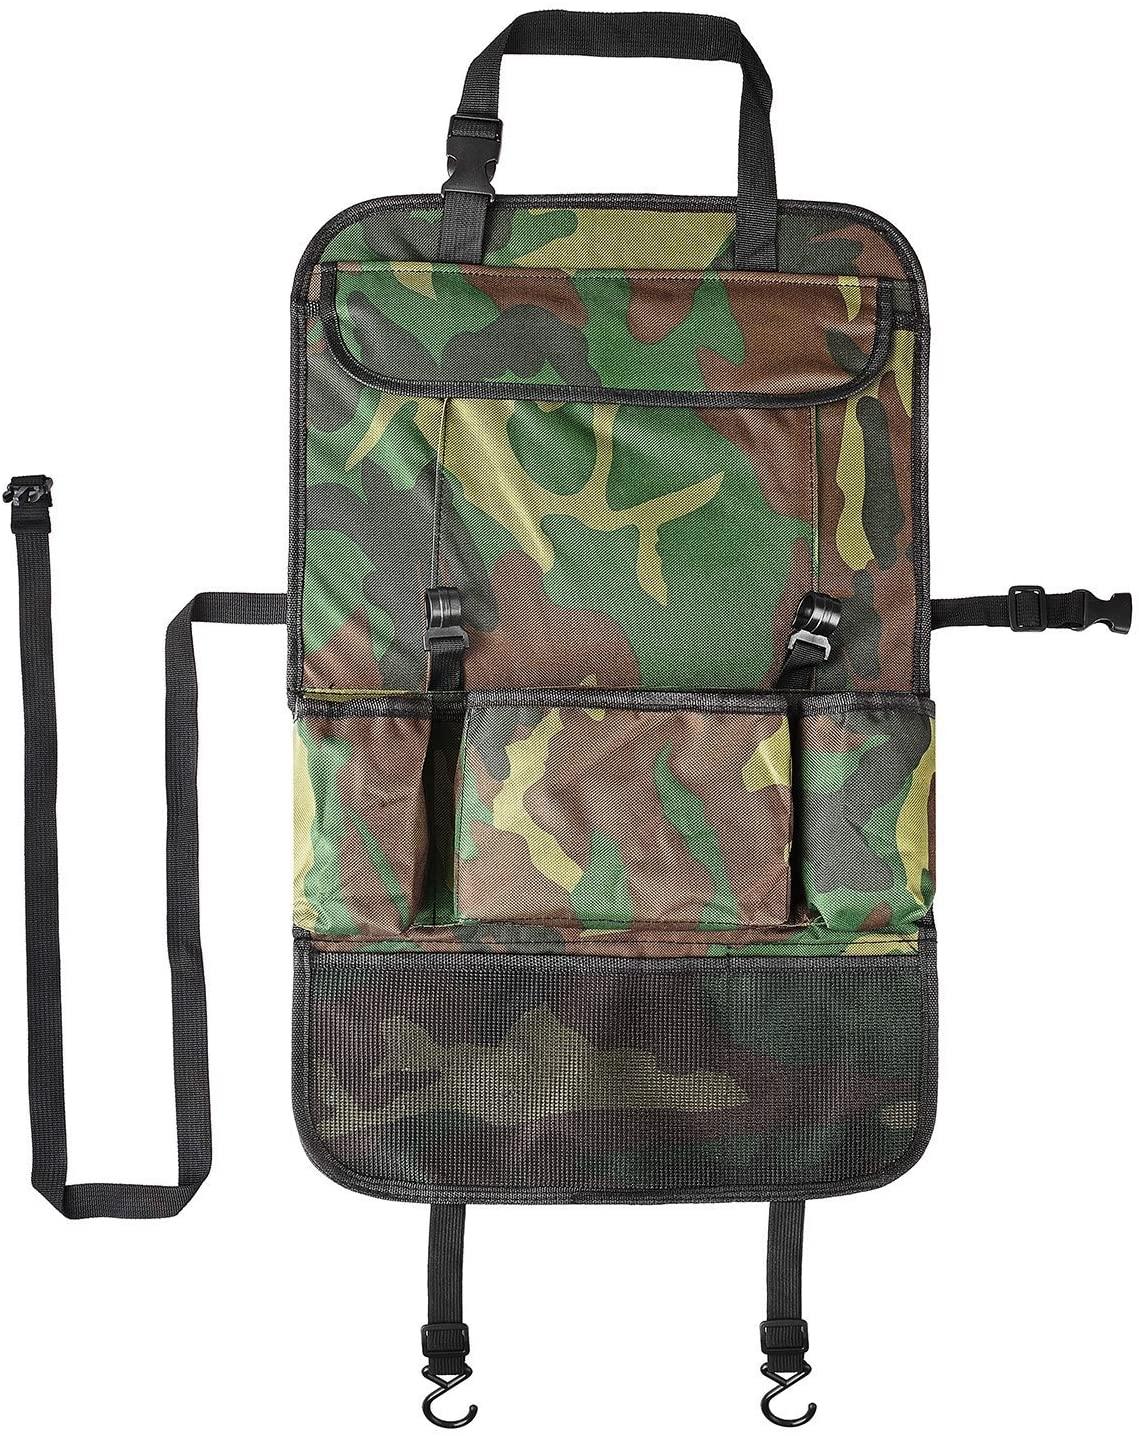 HCMAX 2 Pack Car Seat Back Organizer Pocket Backseat Protector Storage Bag Tablet Holder Kick Mat ipad Holder Multi-Pocket Great Travel Accessory Camouflage A